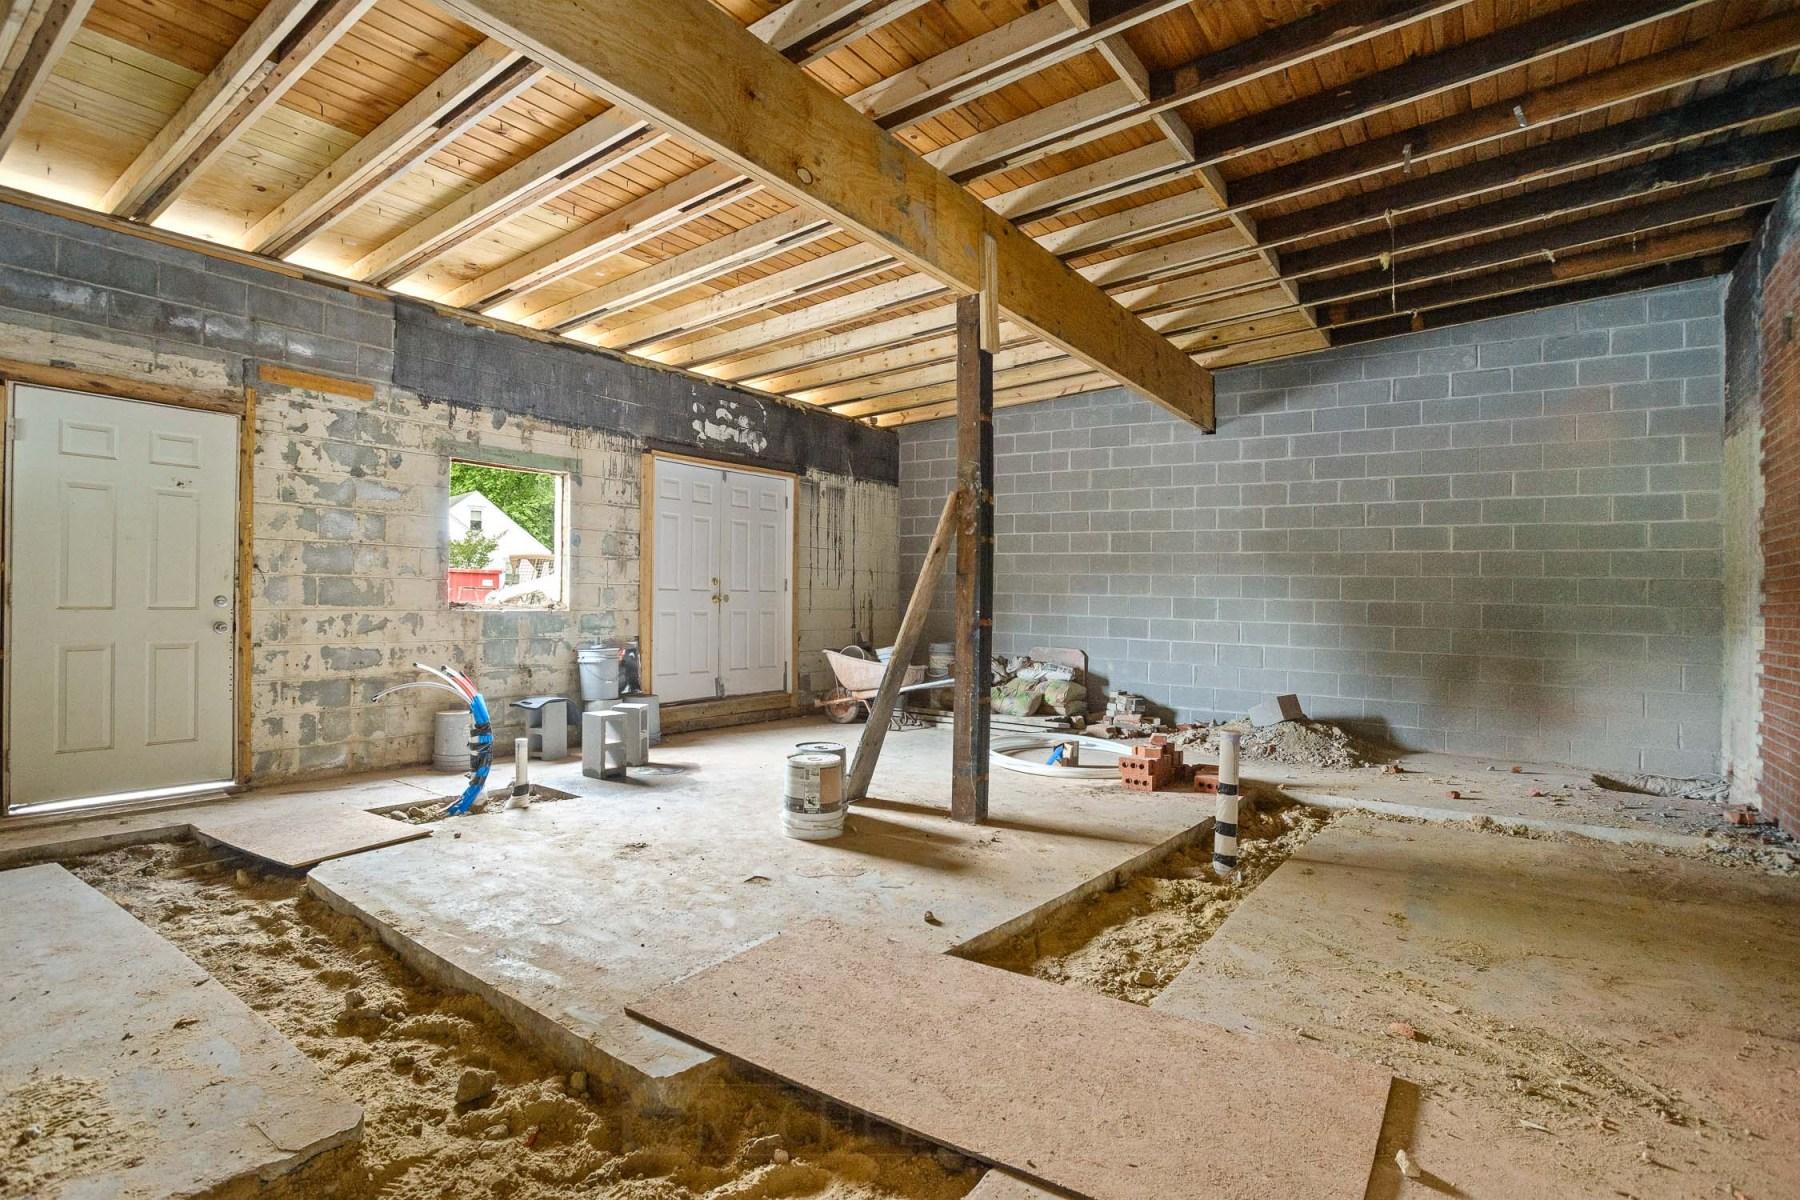 Horizons-East-Office-Renovation-1st-Set-27May2021_SB_01283_web-size